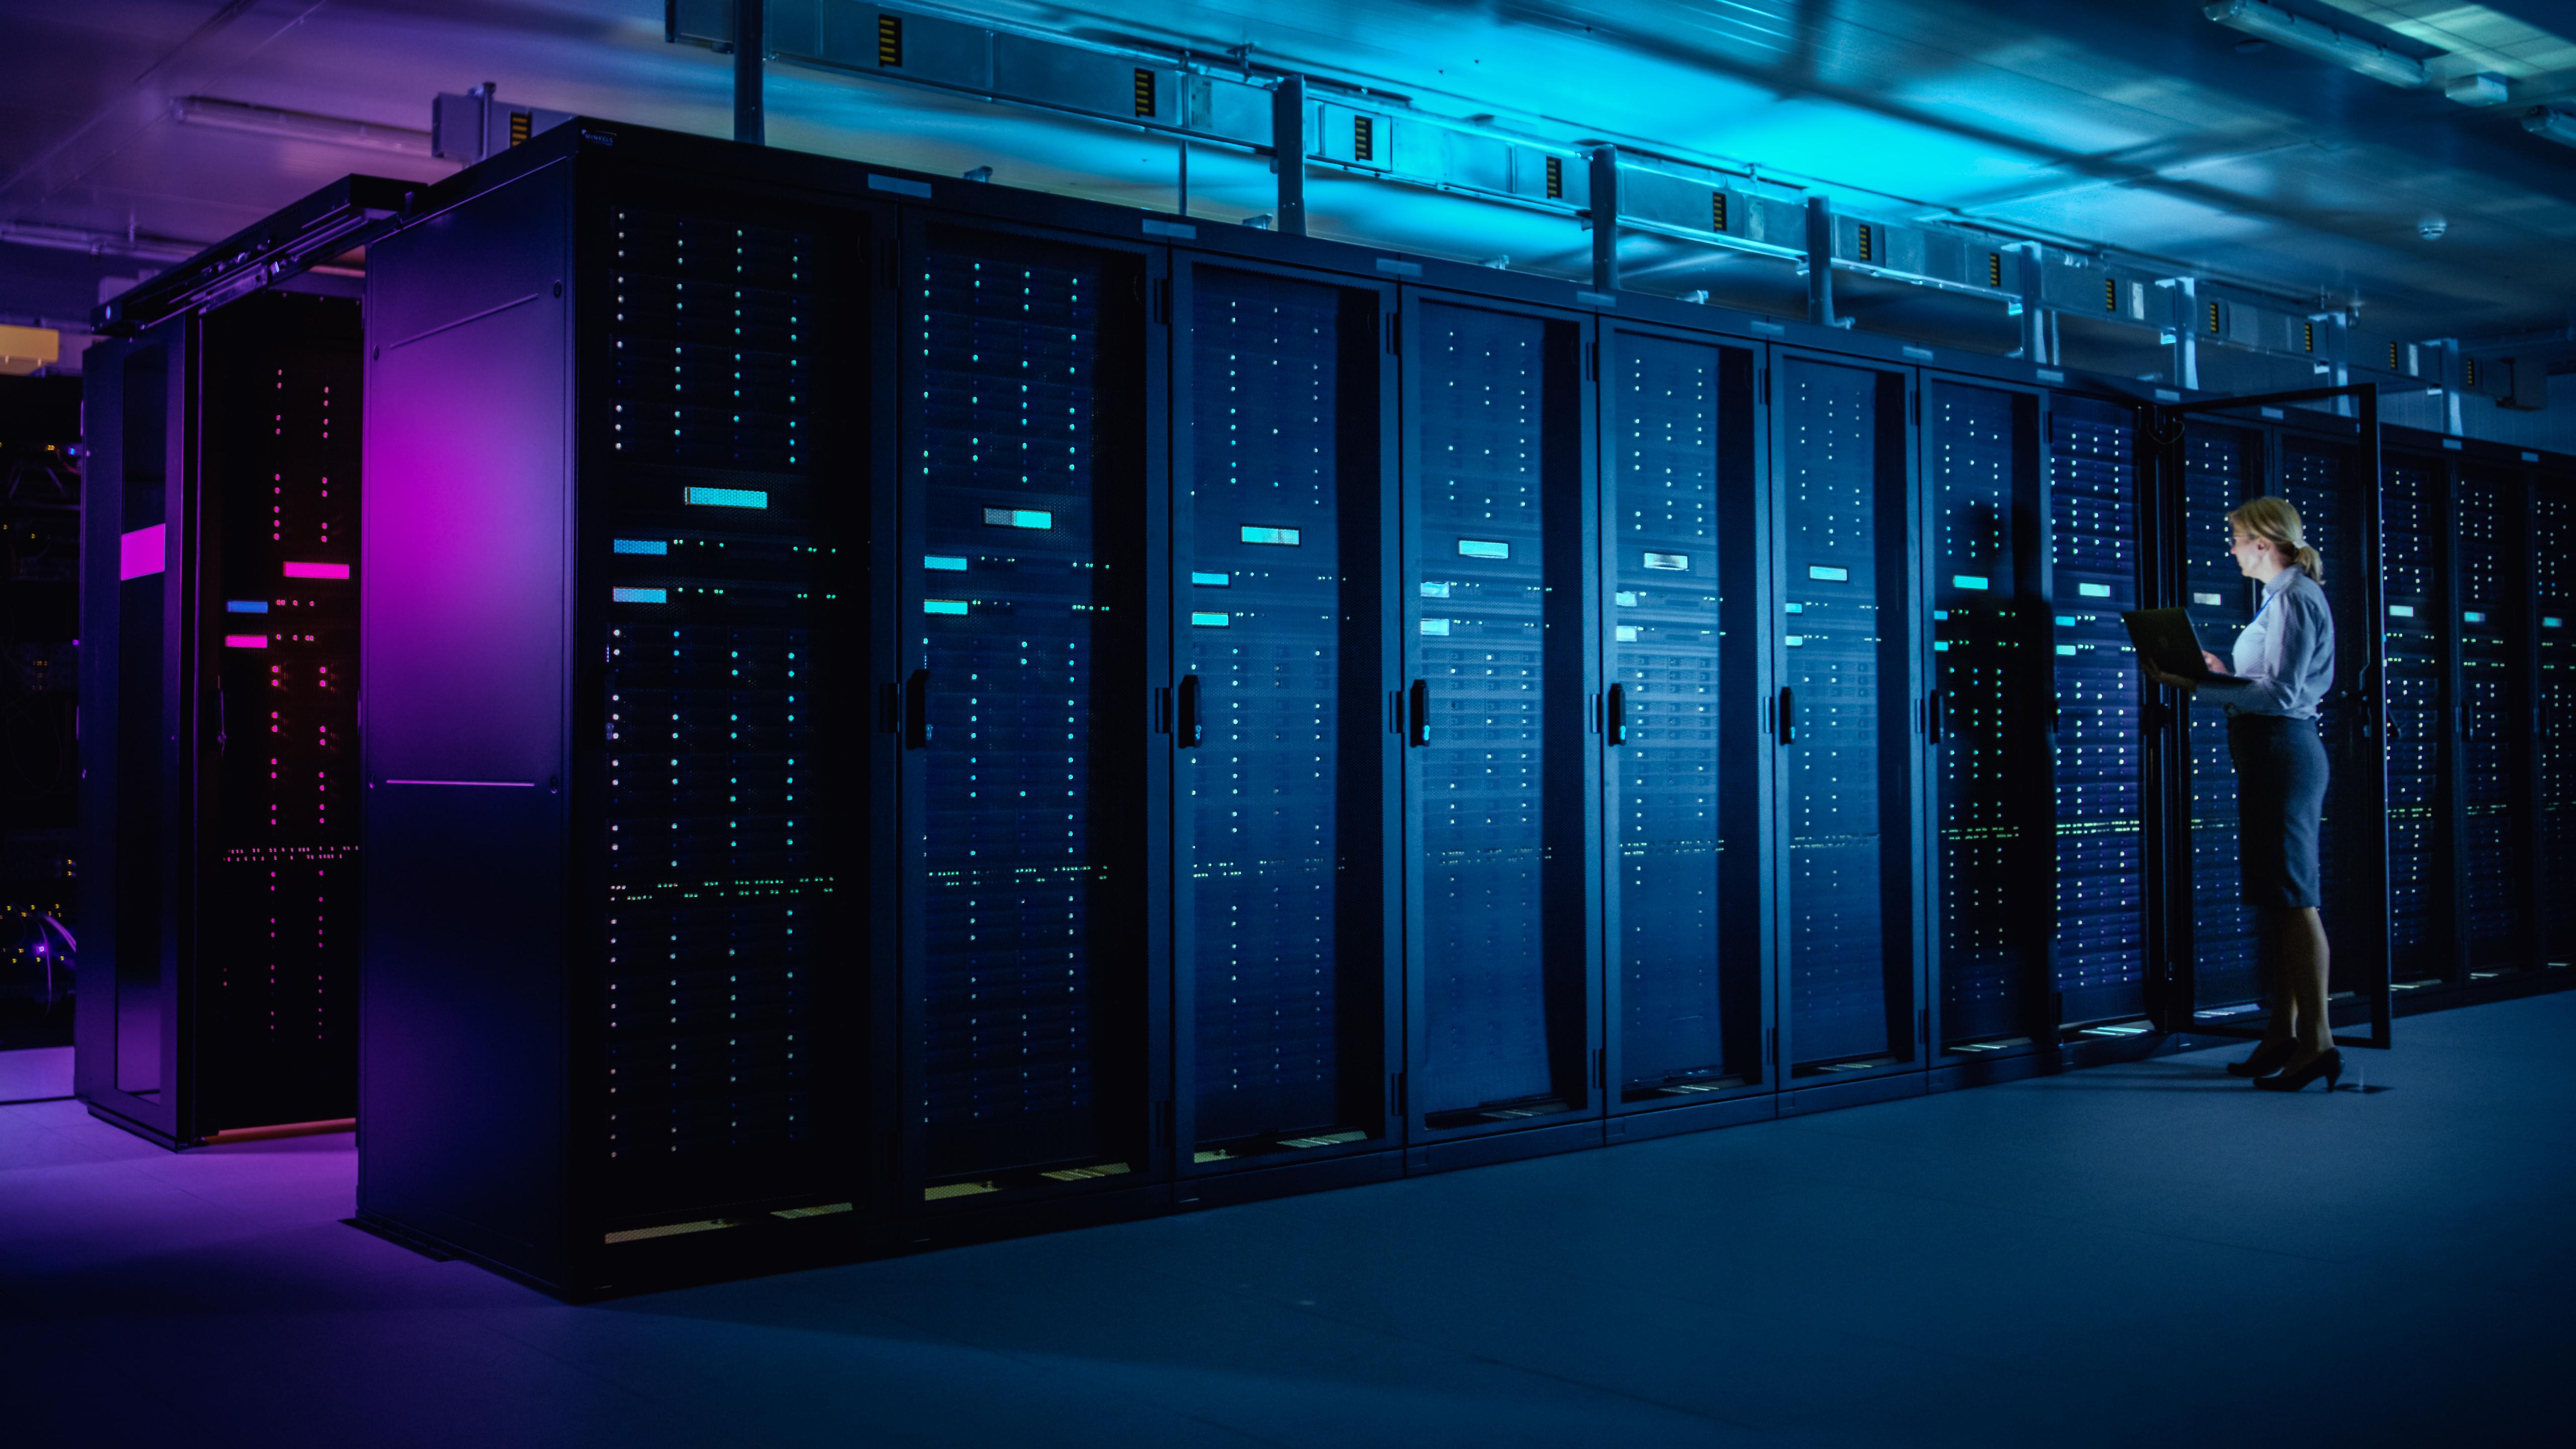 In Data Center: IT Technician Running Maintenance Programme on Laptop, Controls Operational Server Rack Optimal Functioning. Modern High-Tech Telecommunications Operational Data Center in Neon Lights.